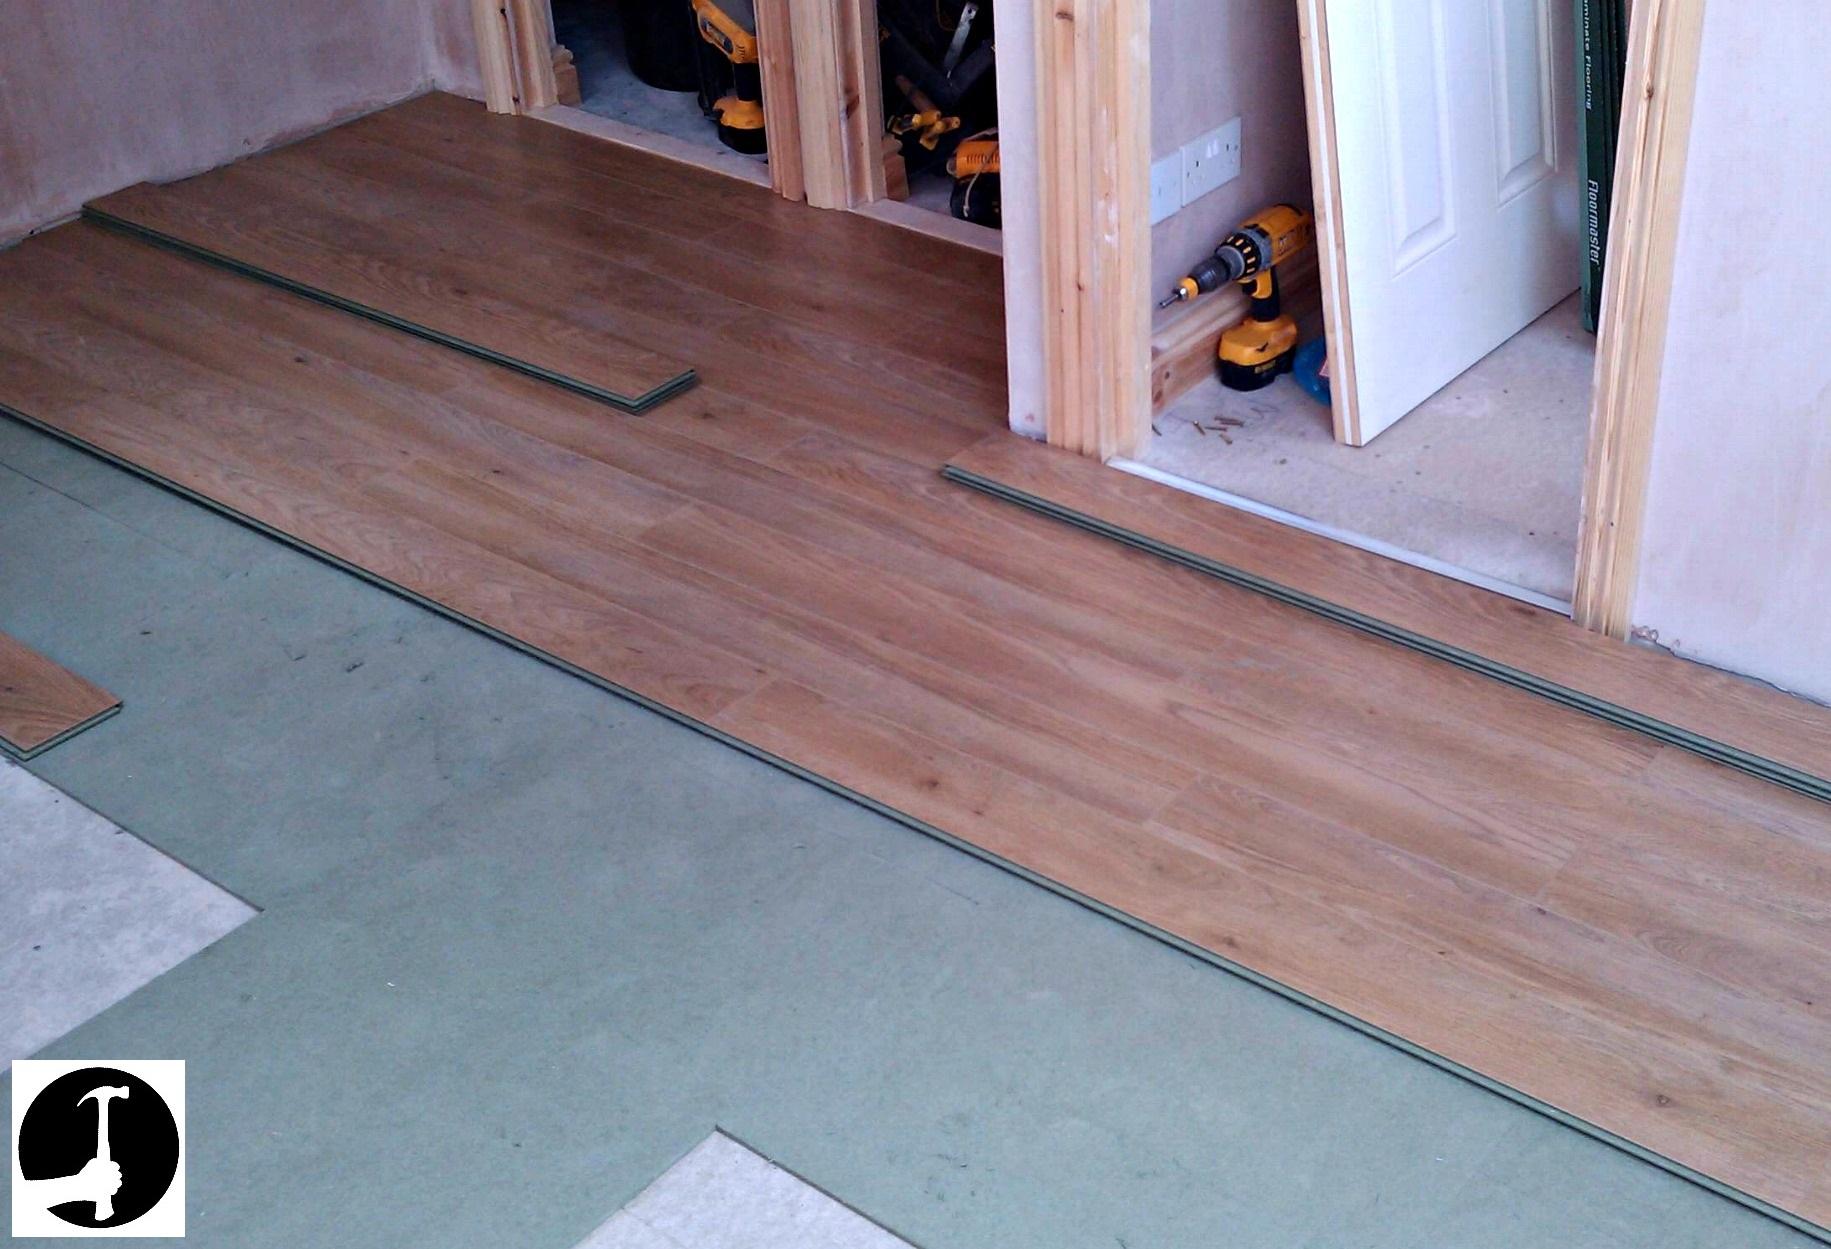 See How I Install Laminate Flooring To, How To Start Lay Laminate Flooring